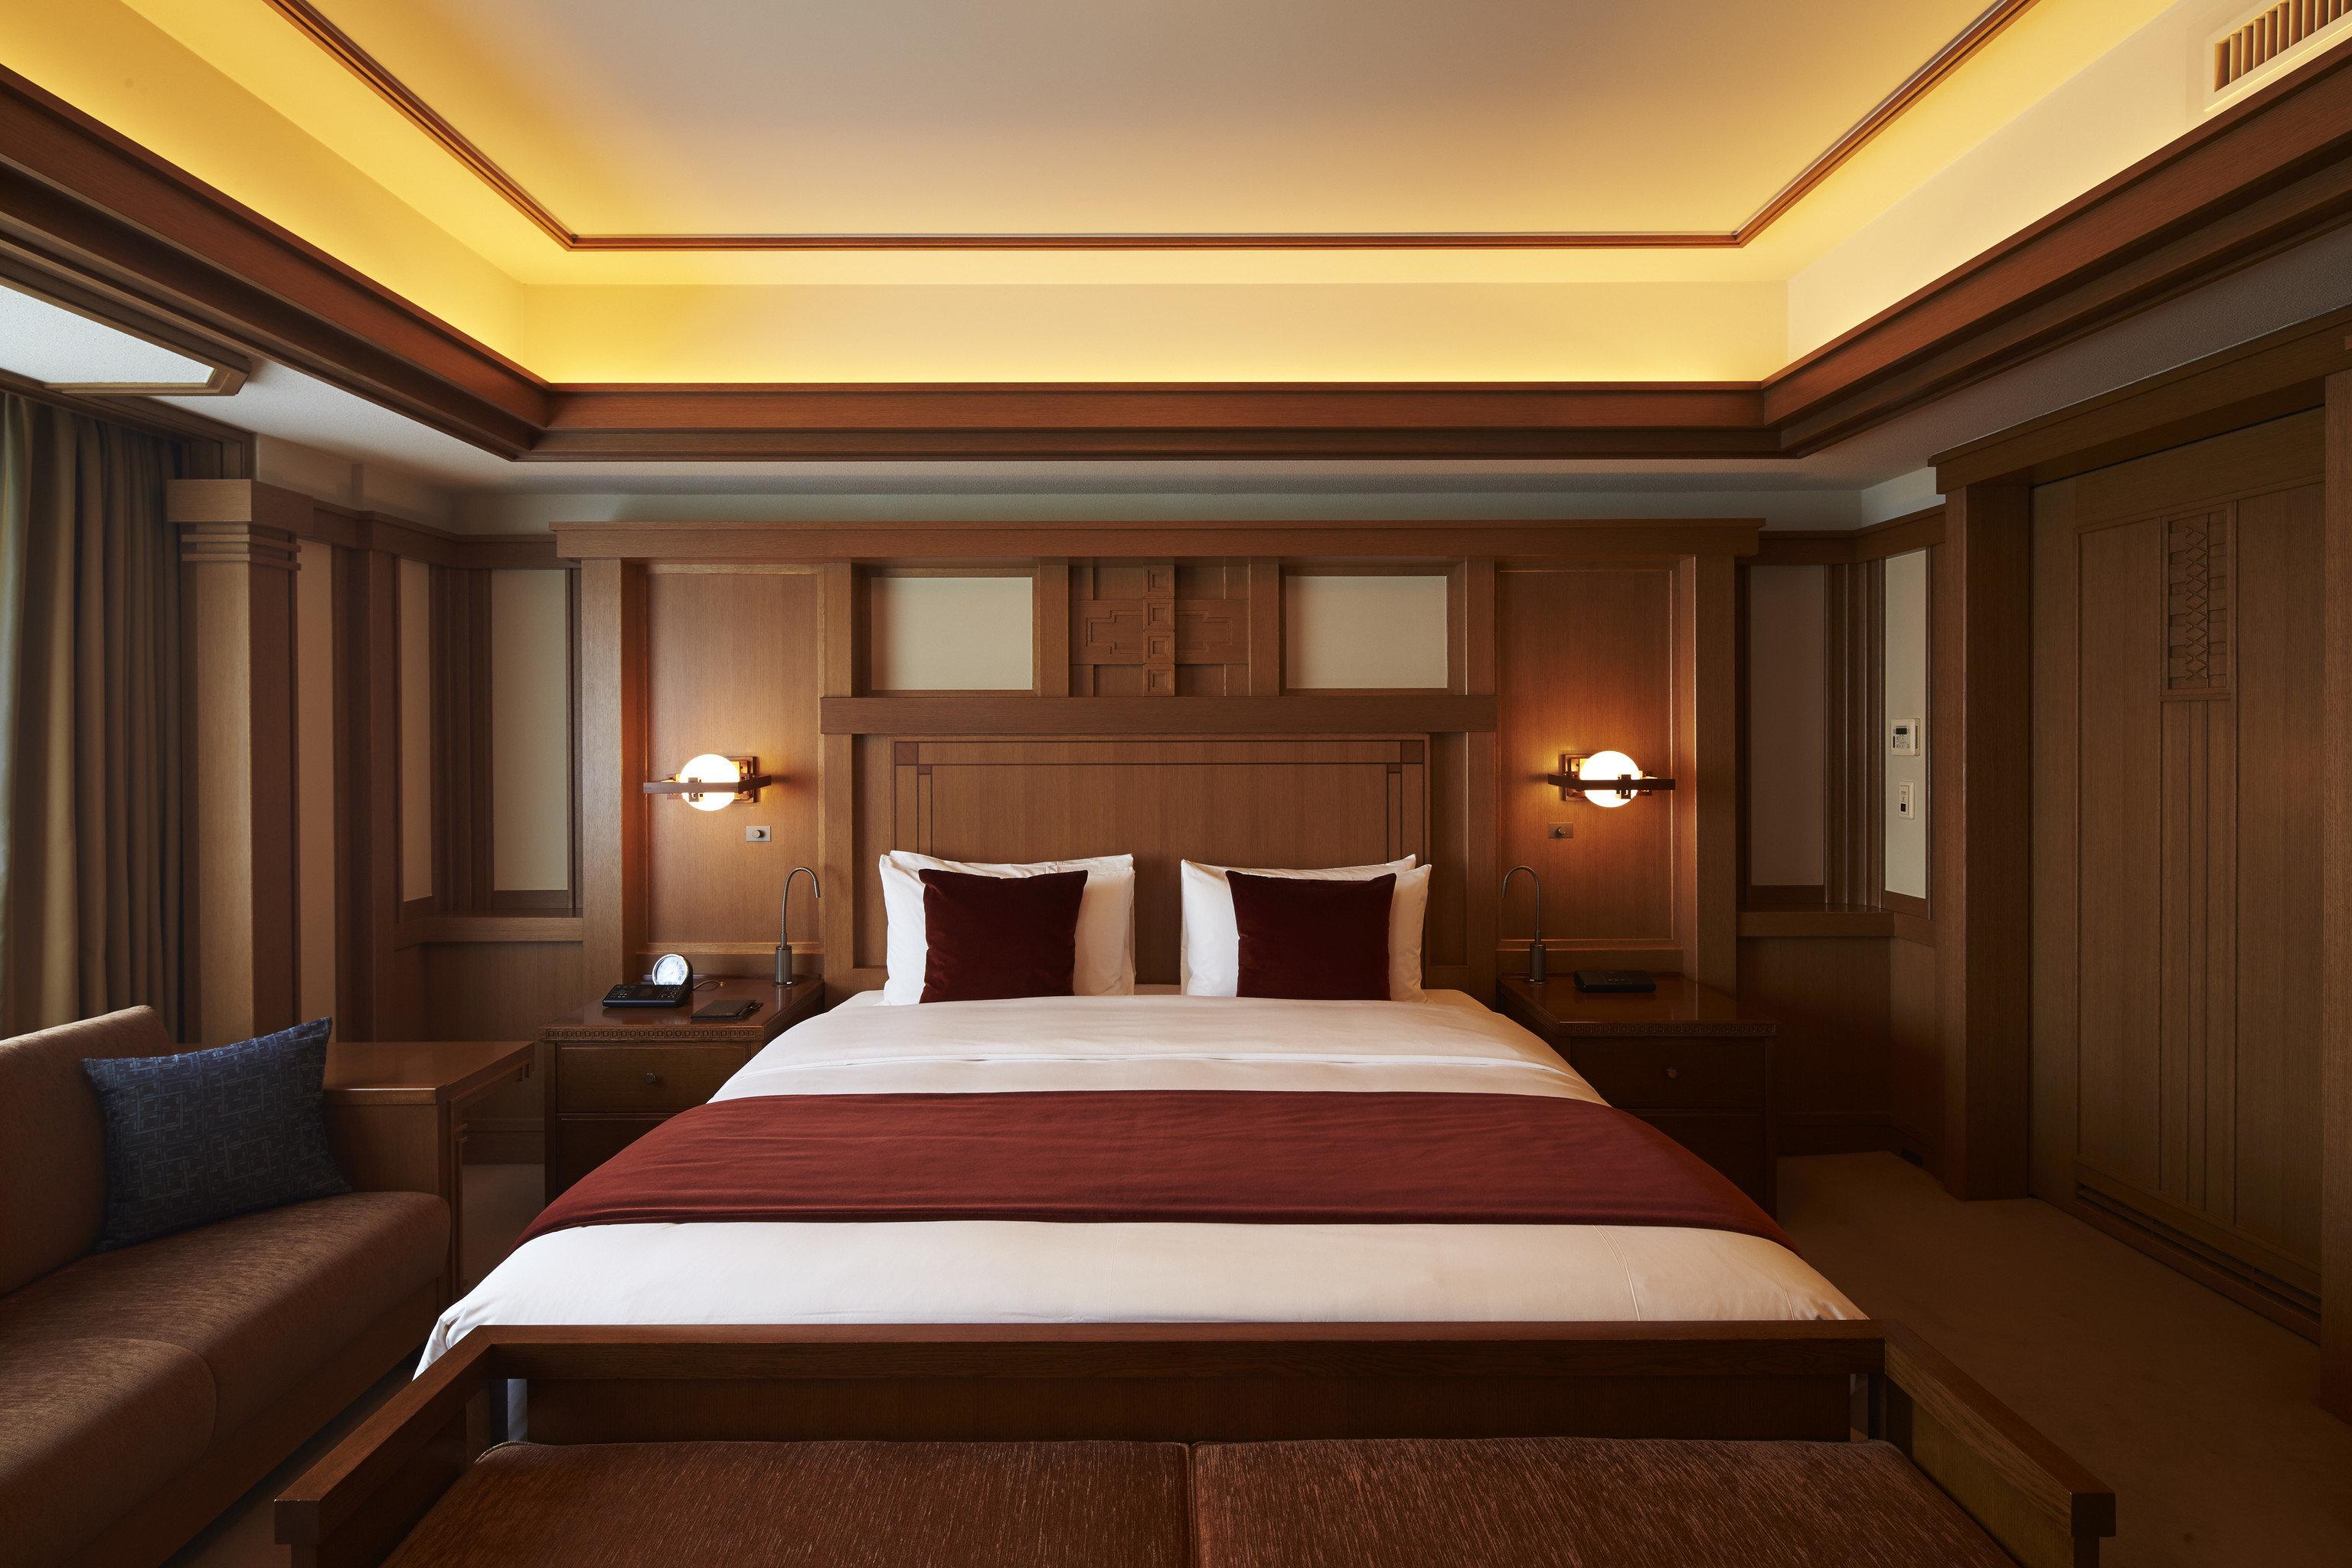 Hotels Japan Tokyo bed wall indoor ceiling room floor Bedroom hotel Suite interior design estate yacht billiard room recreation room conference hall